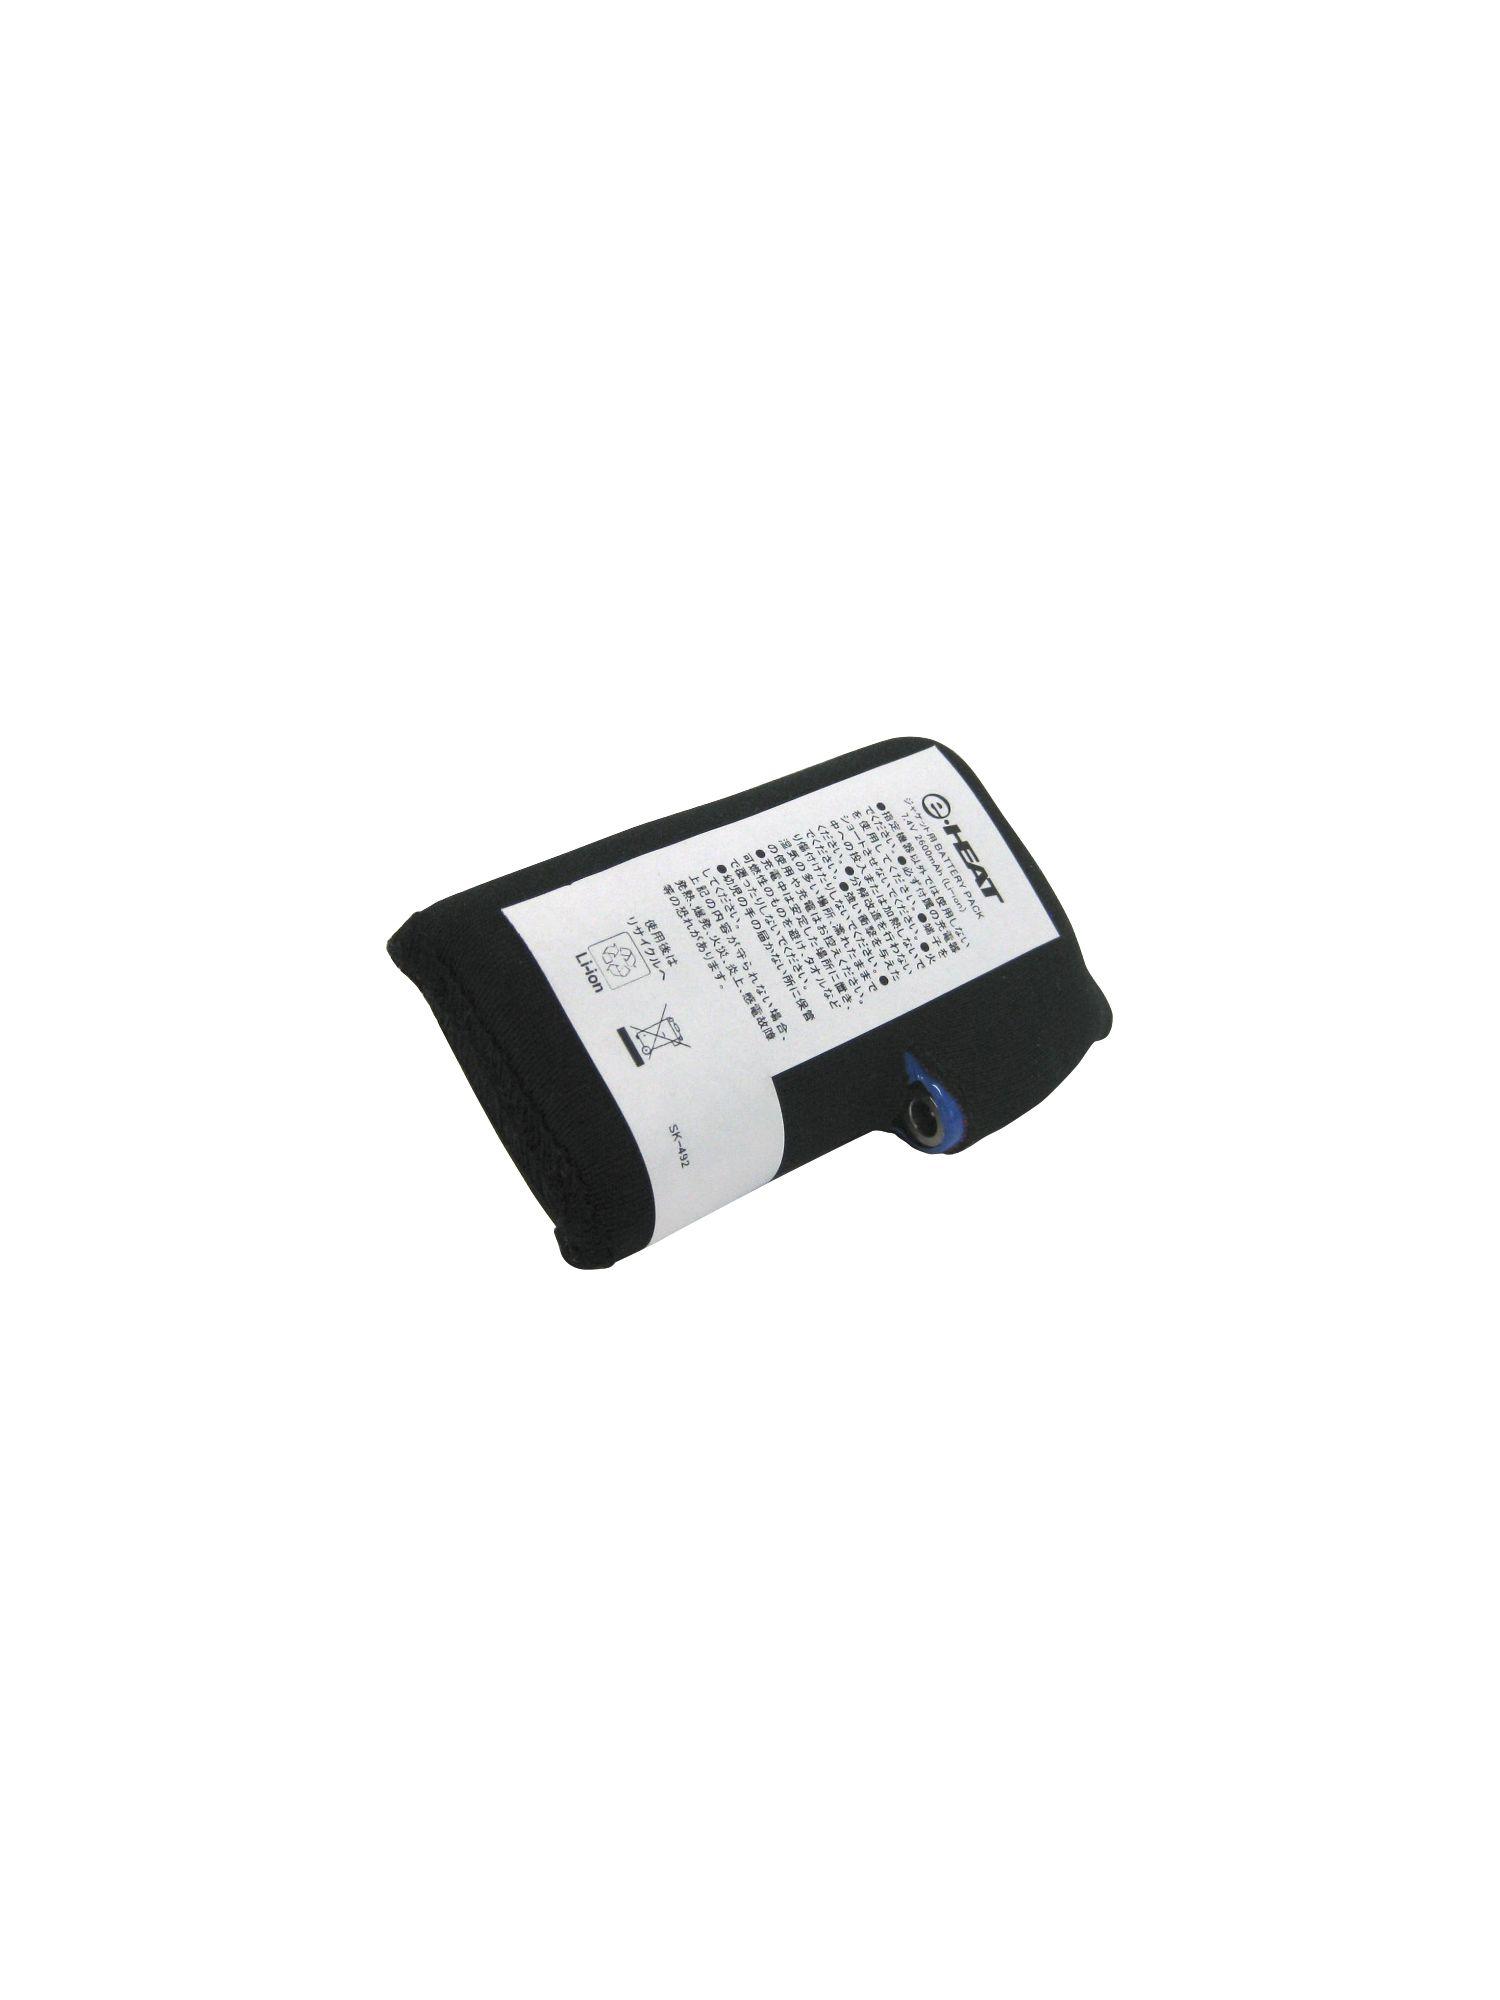 RSP019|e-HEAT ベスト用スペア バッテリー:1個